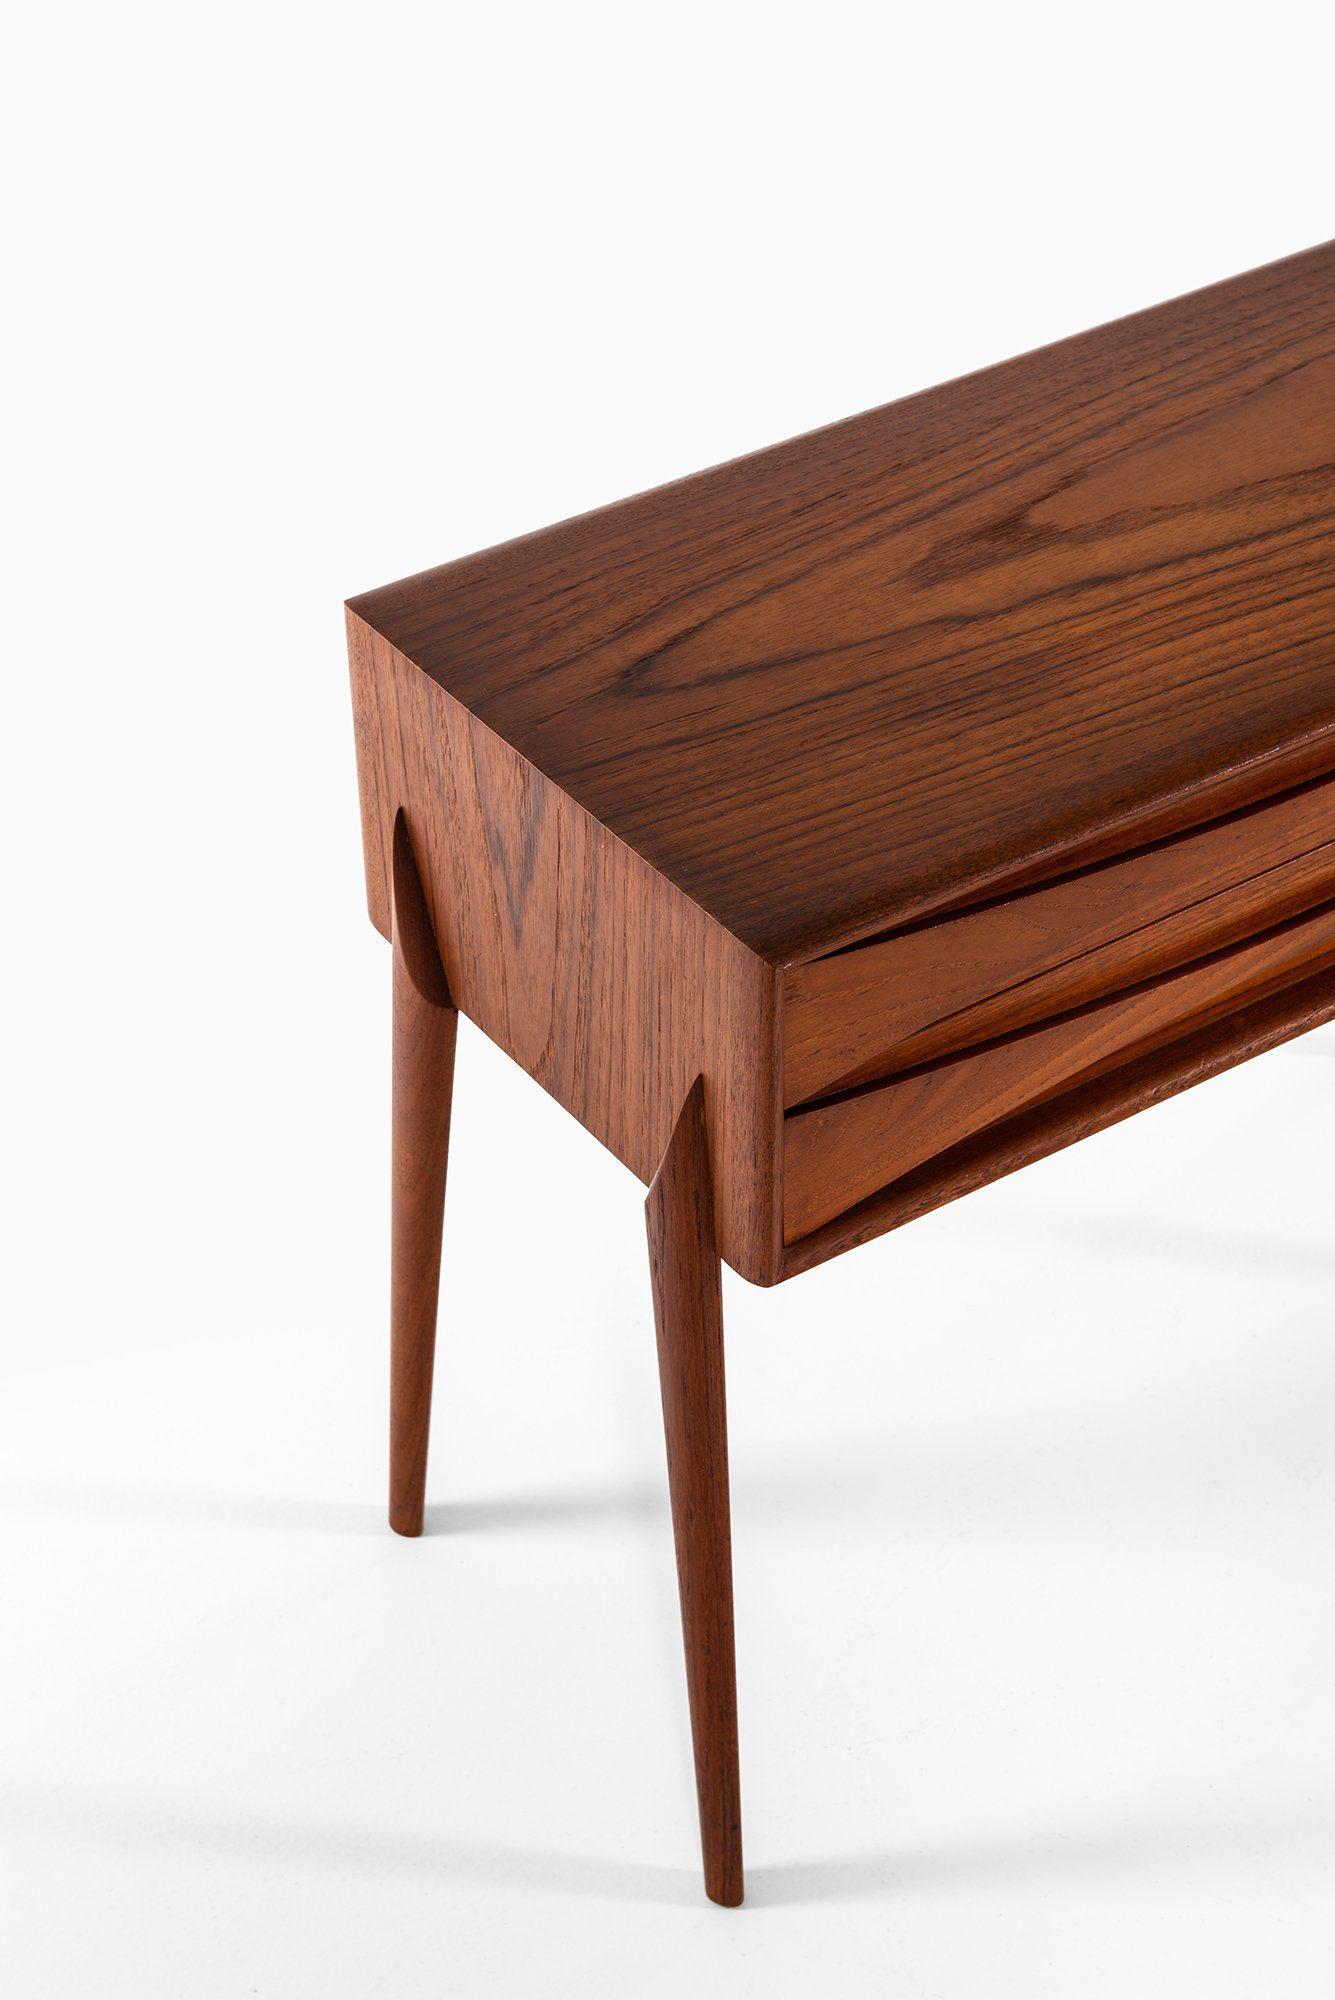 Side Table Bureau.Rimbert Sandholt Side Table Bureau In Teak At Studio Schalling